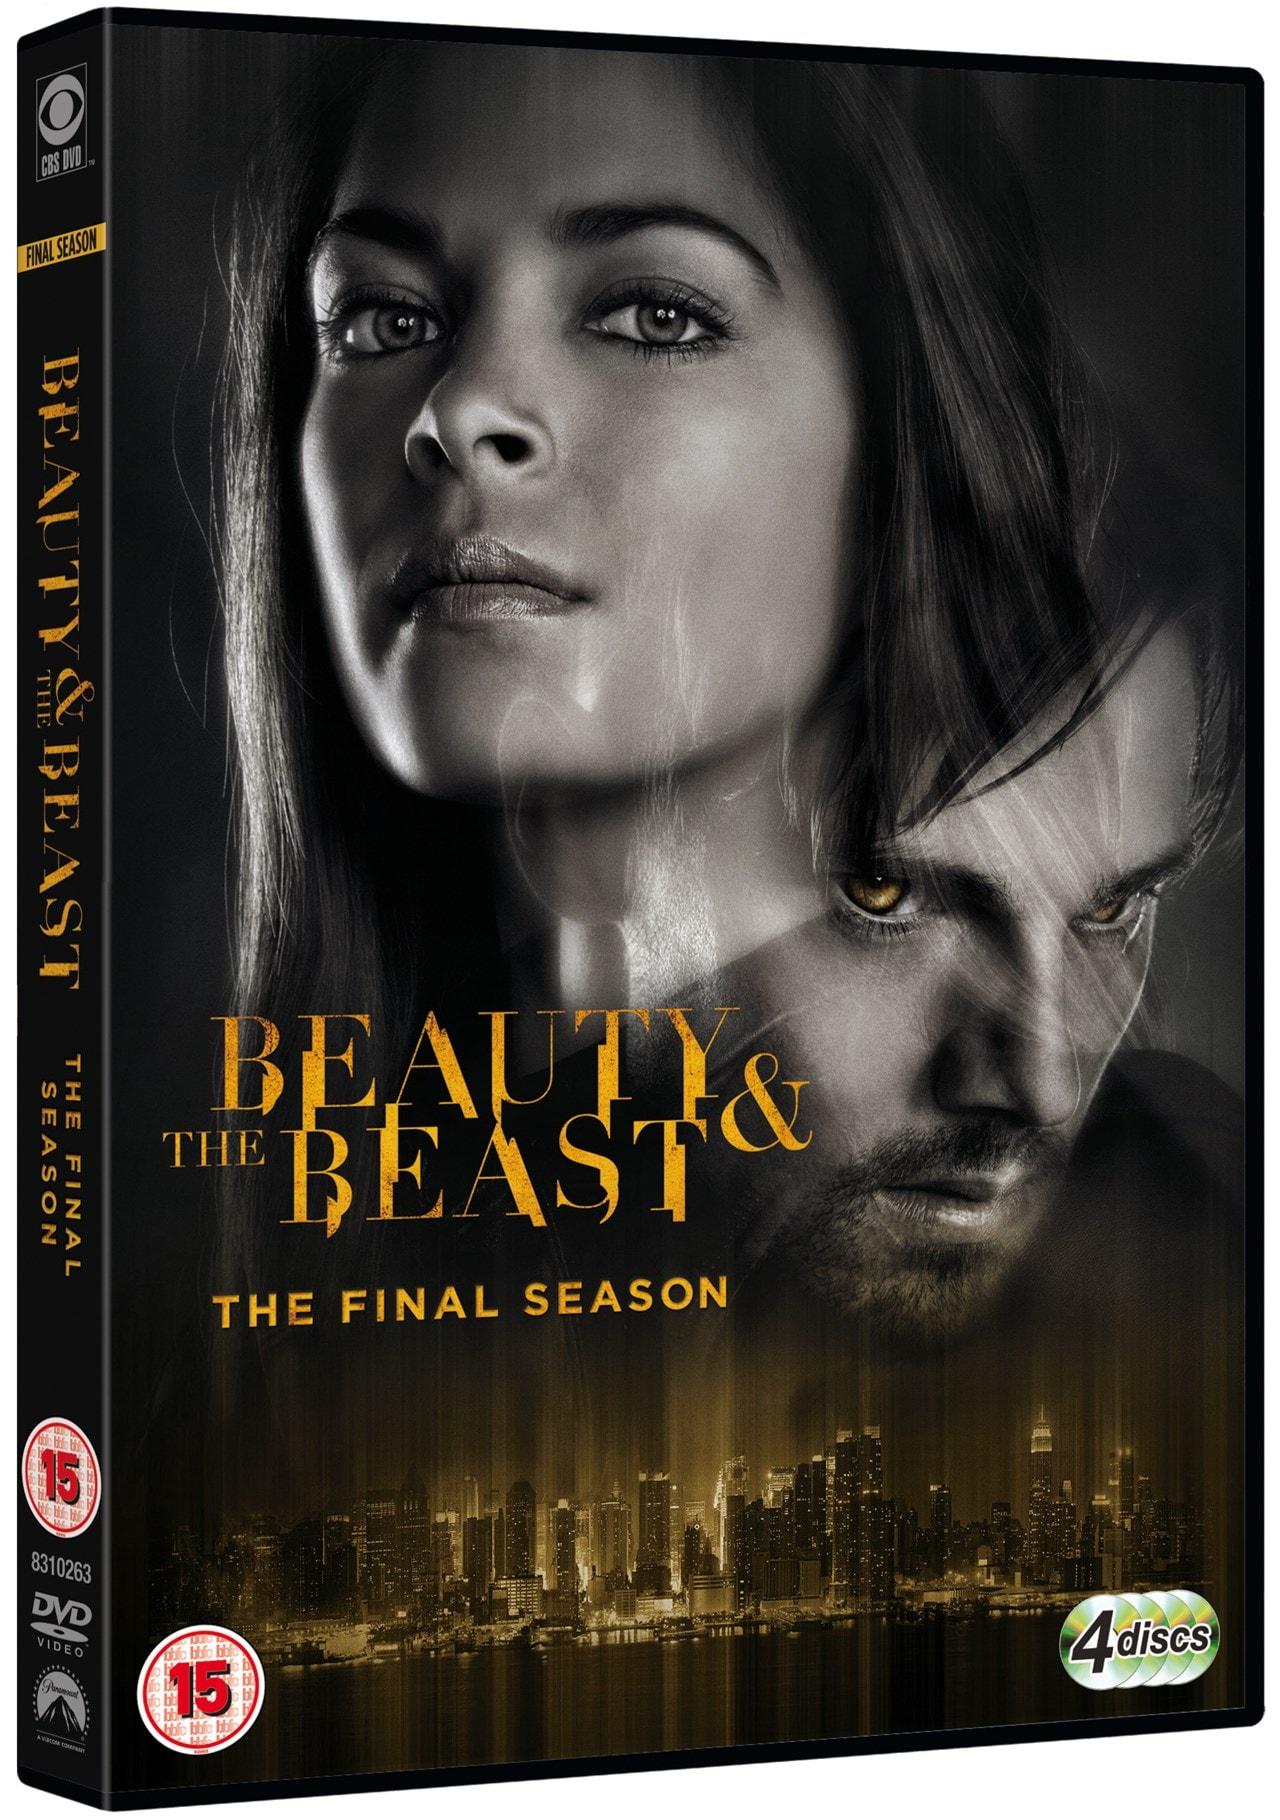 Beauty and the Beast: The Final Season - 2